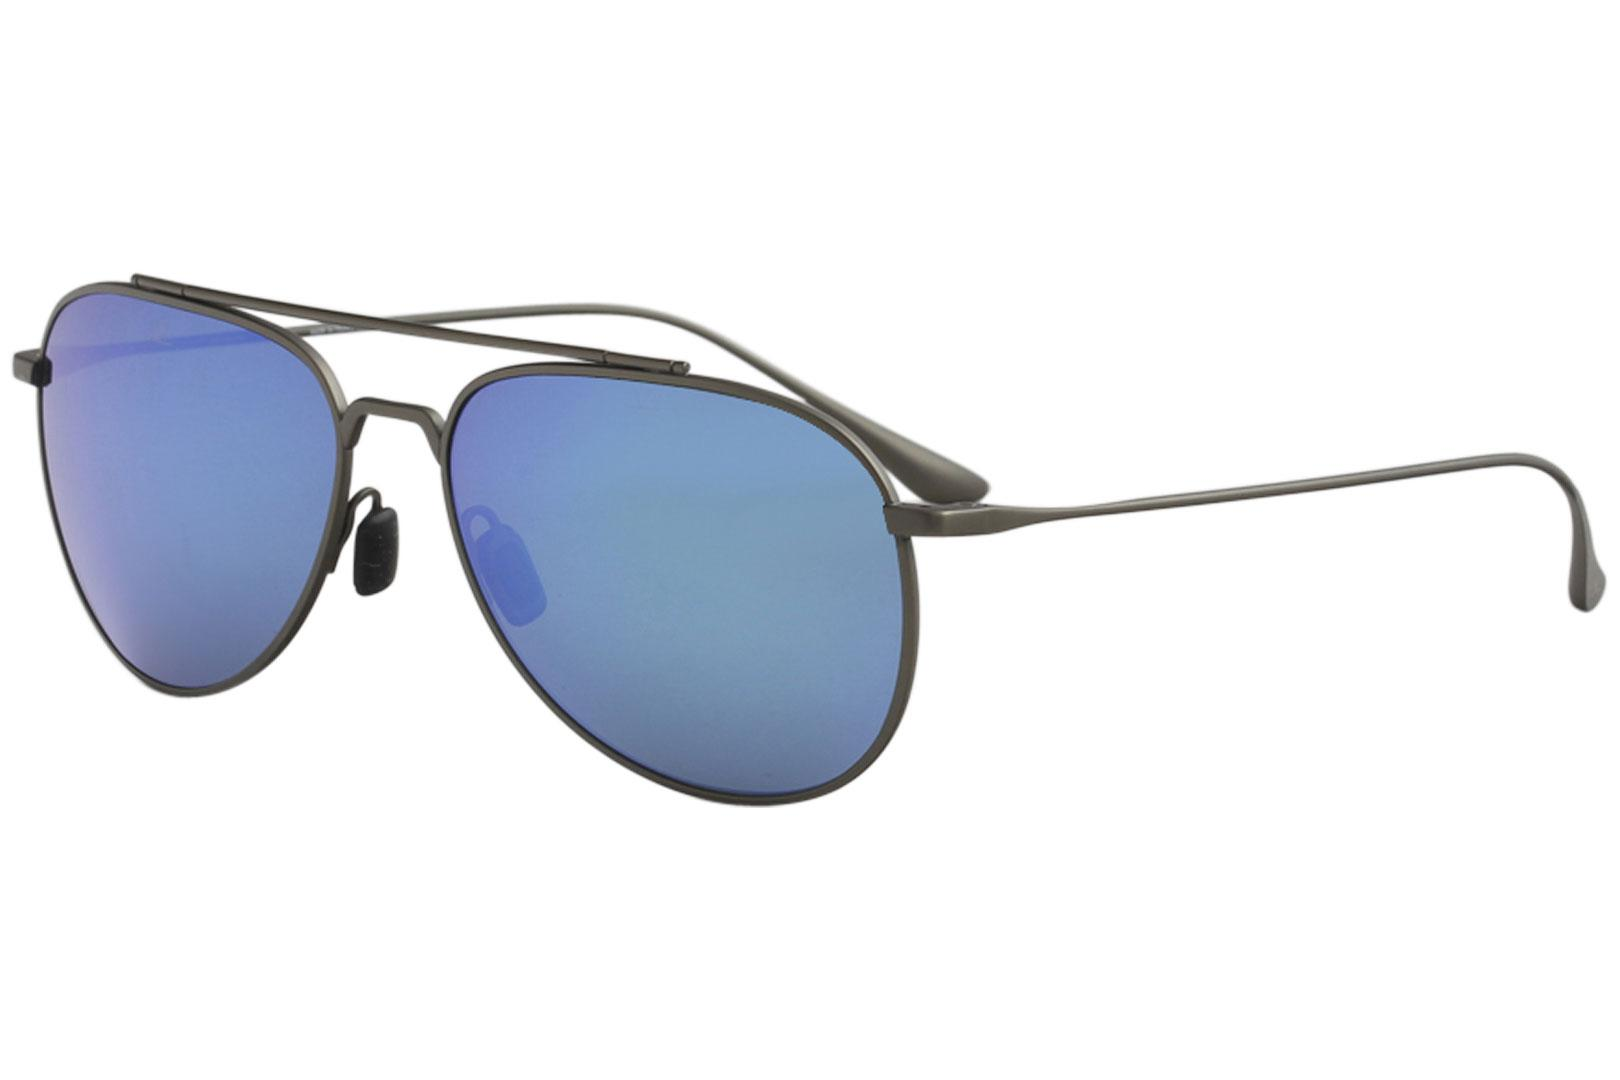 4886718ccbdb Vuarnet Men s Swing Pilot VL1627 VL 1627 Titanium Fashion Sunglasses by  Vuarnet. Touch to zoom